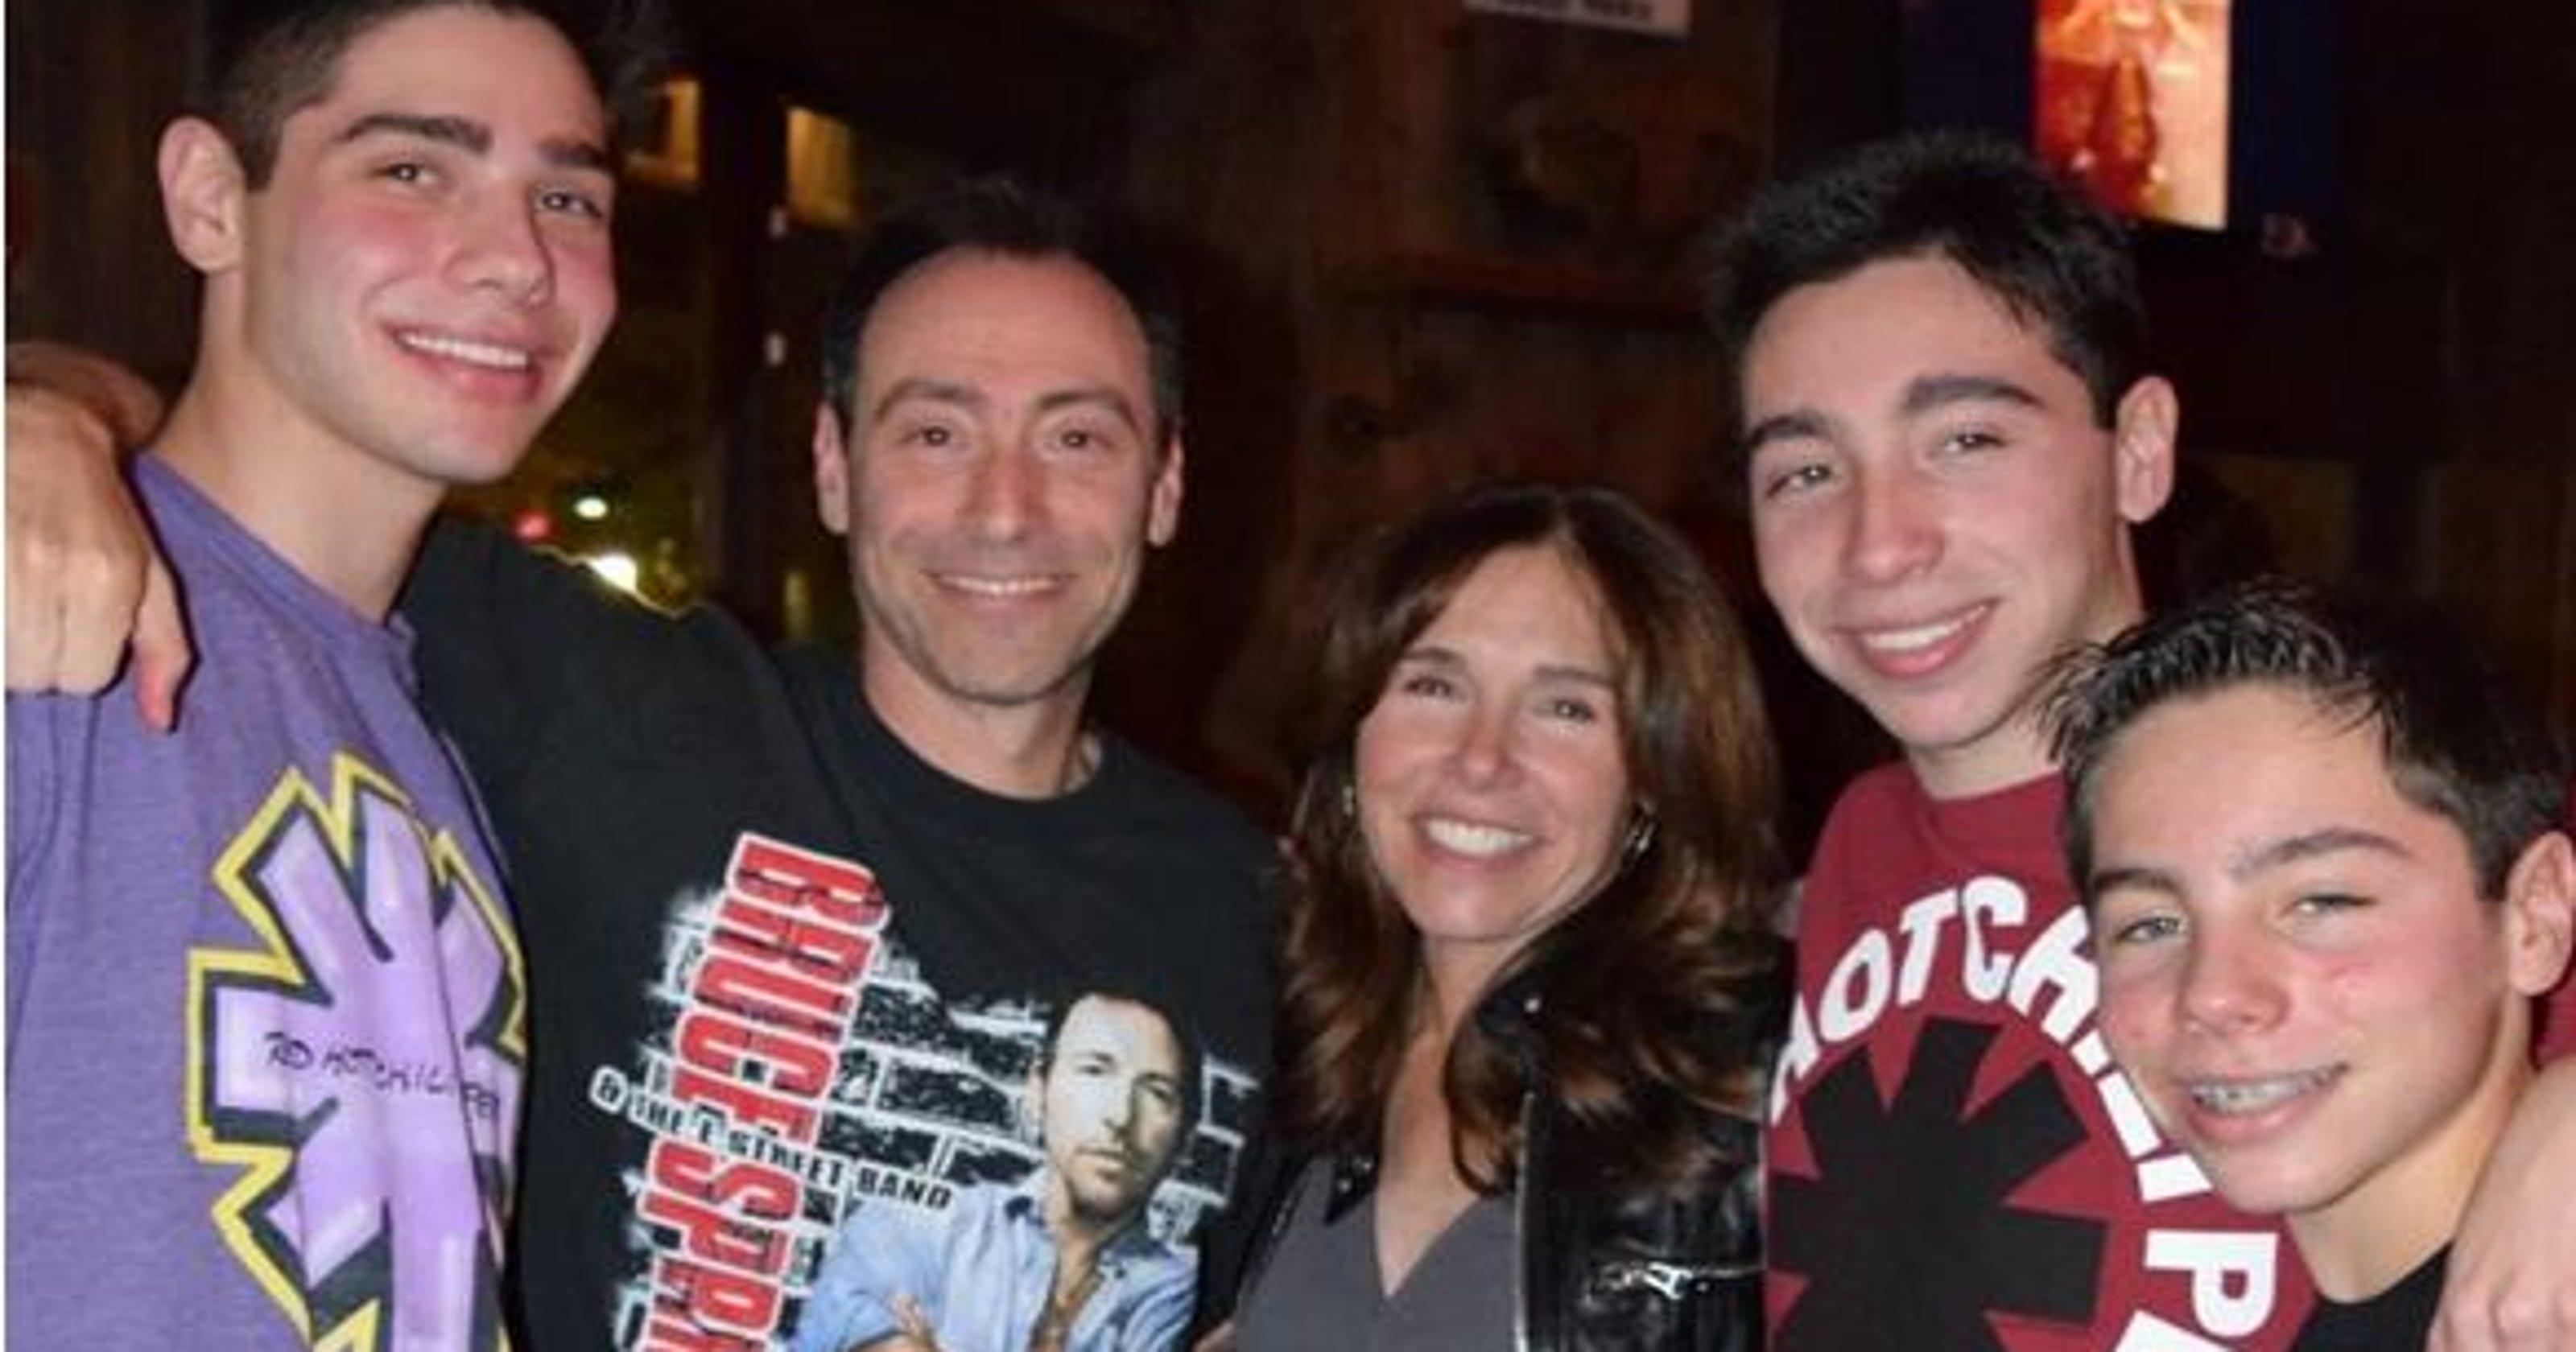 Steinberg memories, new details on New Year's Eve Costa Rica crash